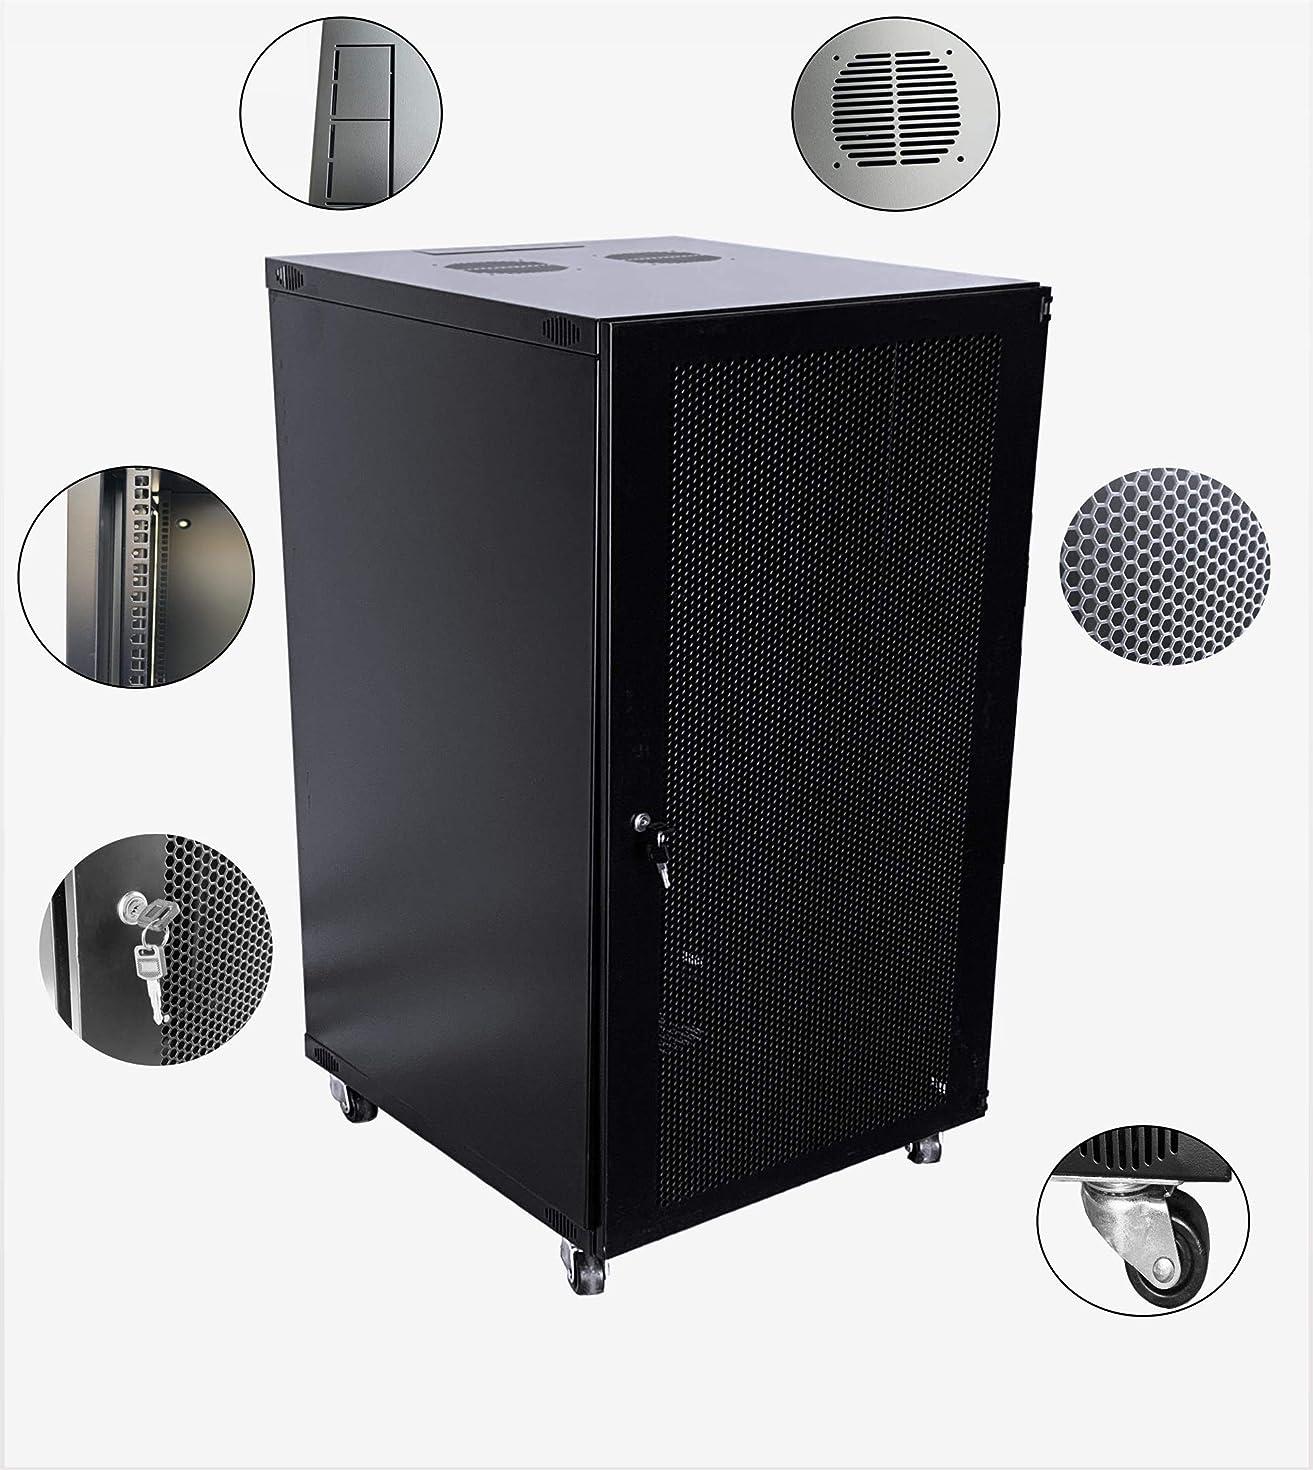 Raising Electronics 22U Wall Mount Network Server Cabinet Rack Enclosure Ventilated Door Lock 600mm Deep (22U)